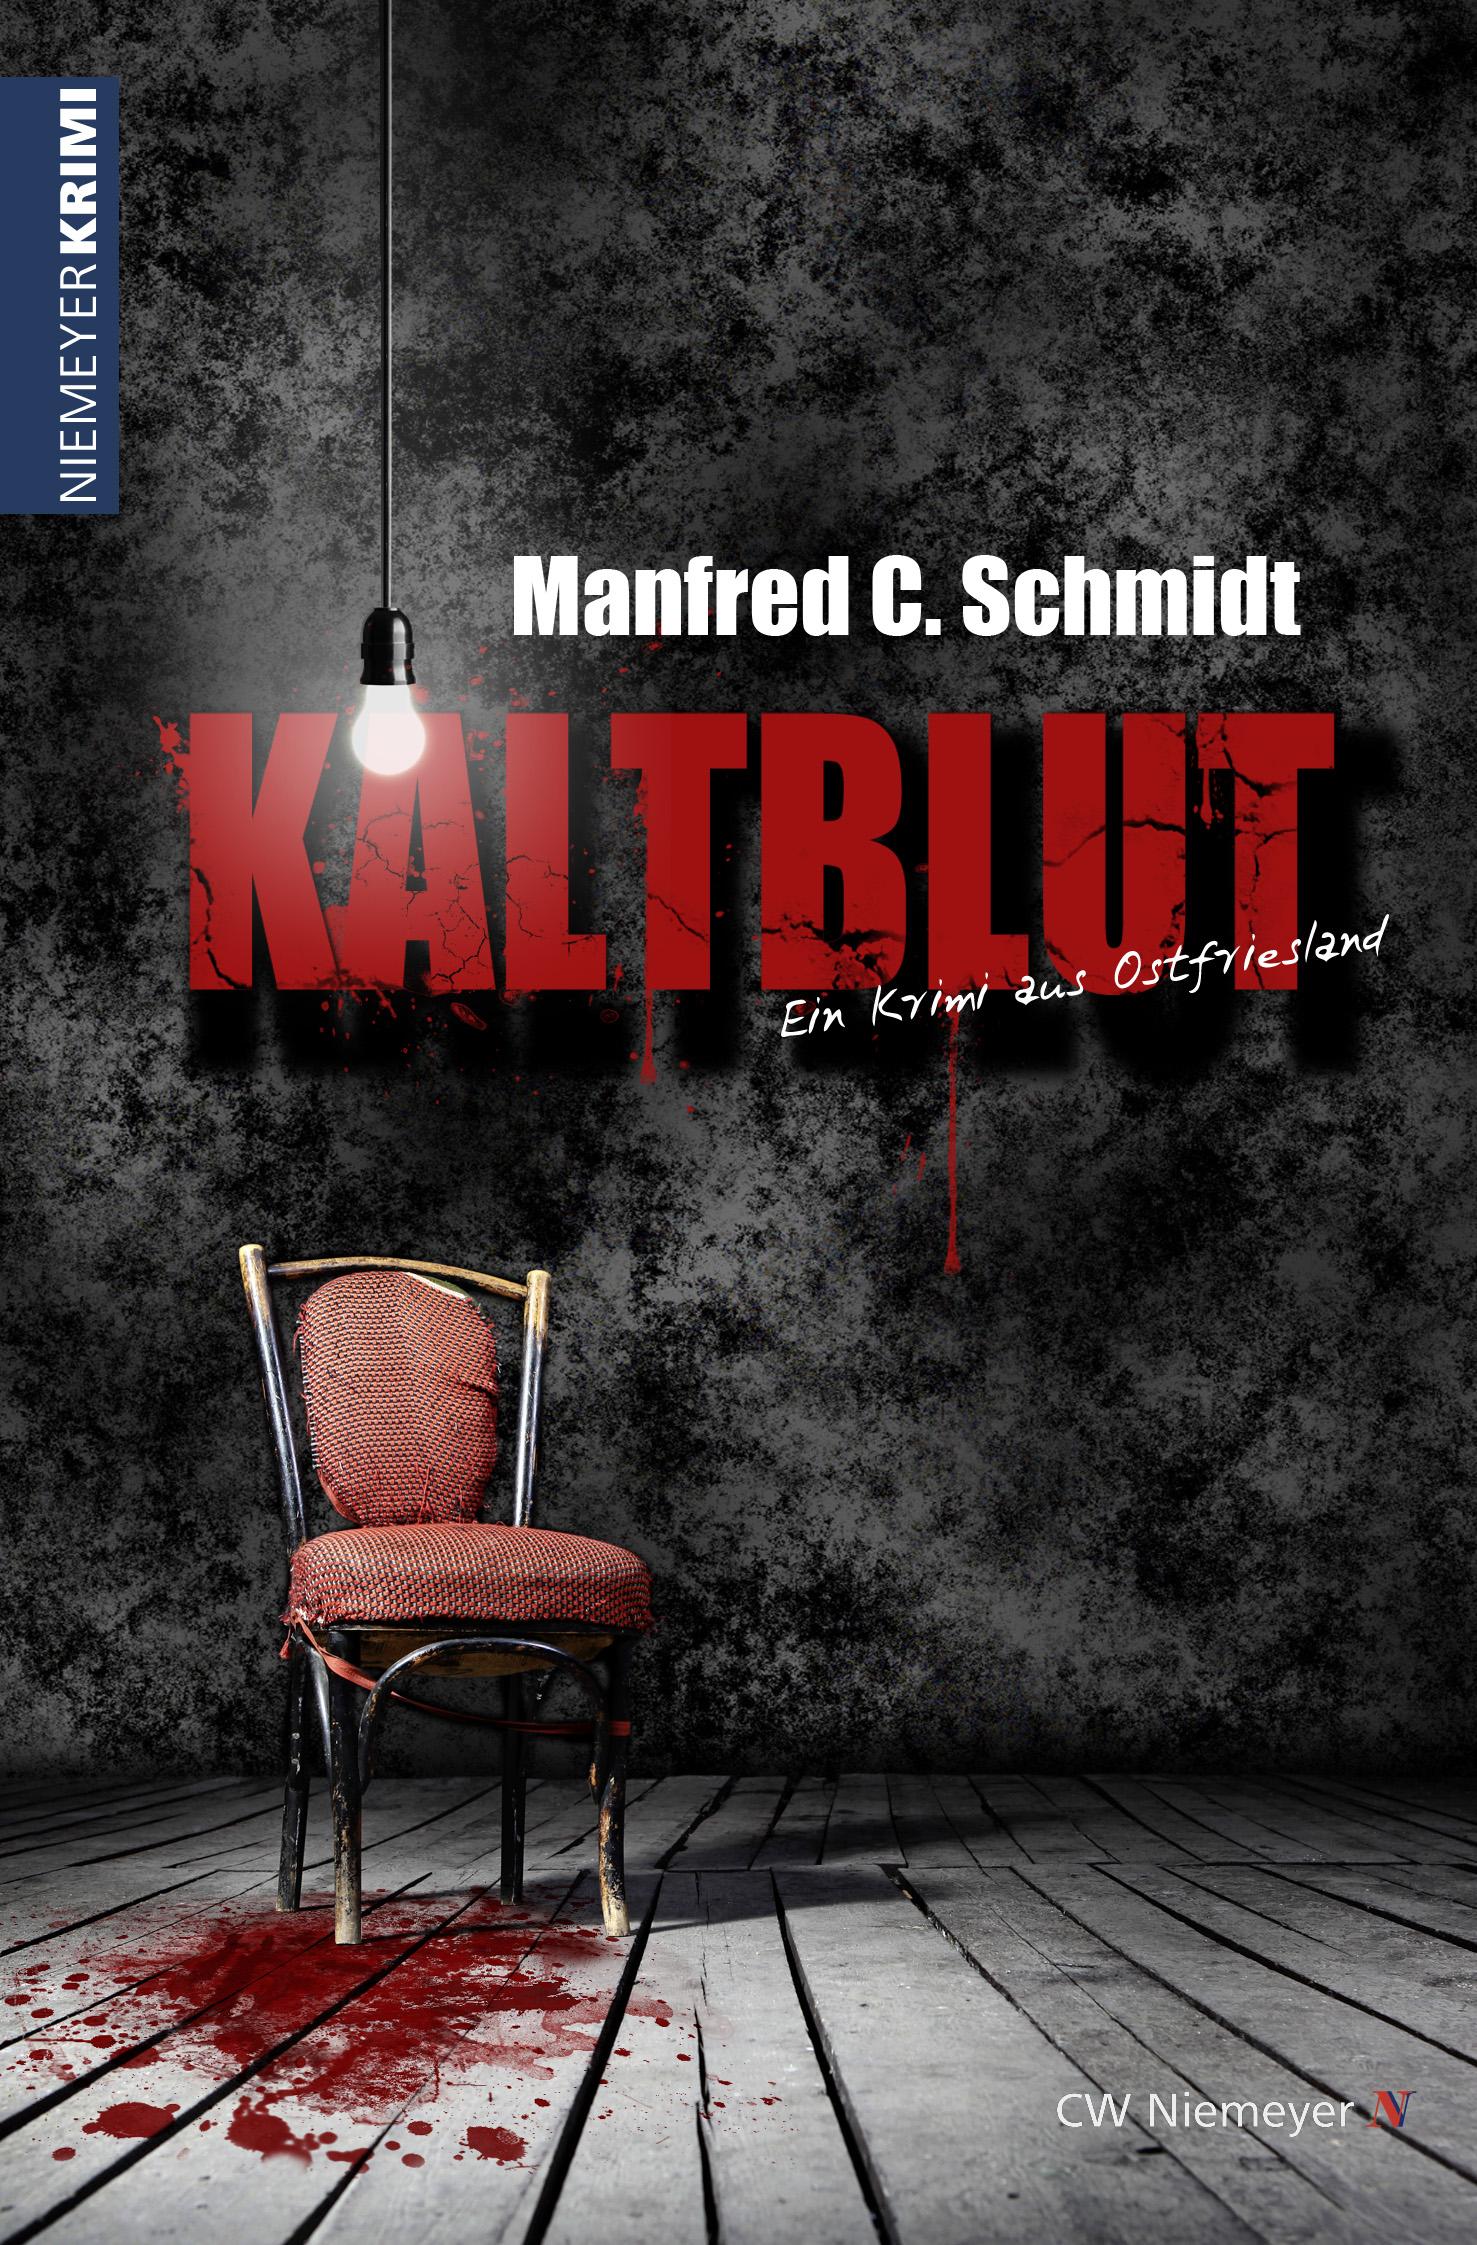 NEU Kaltblut Manfred C Schmidt 195128